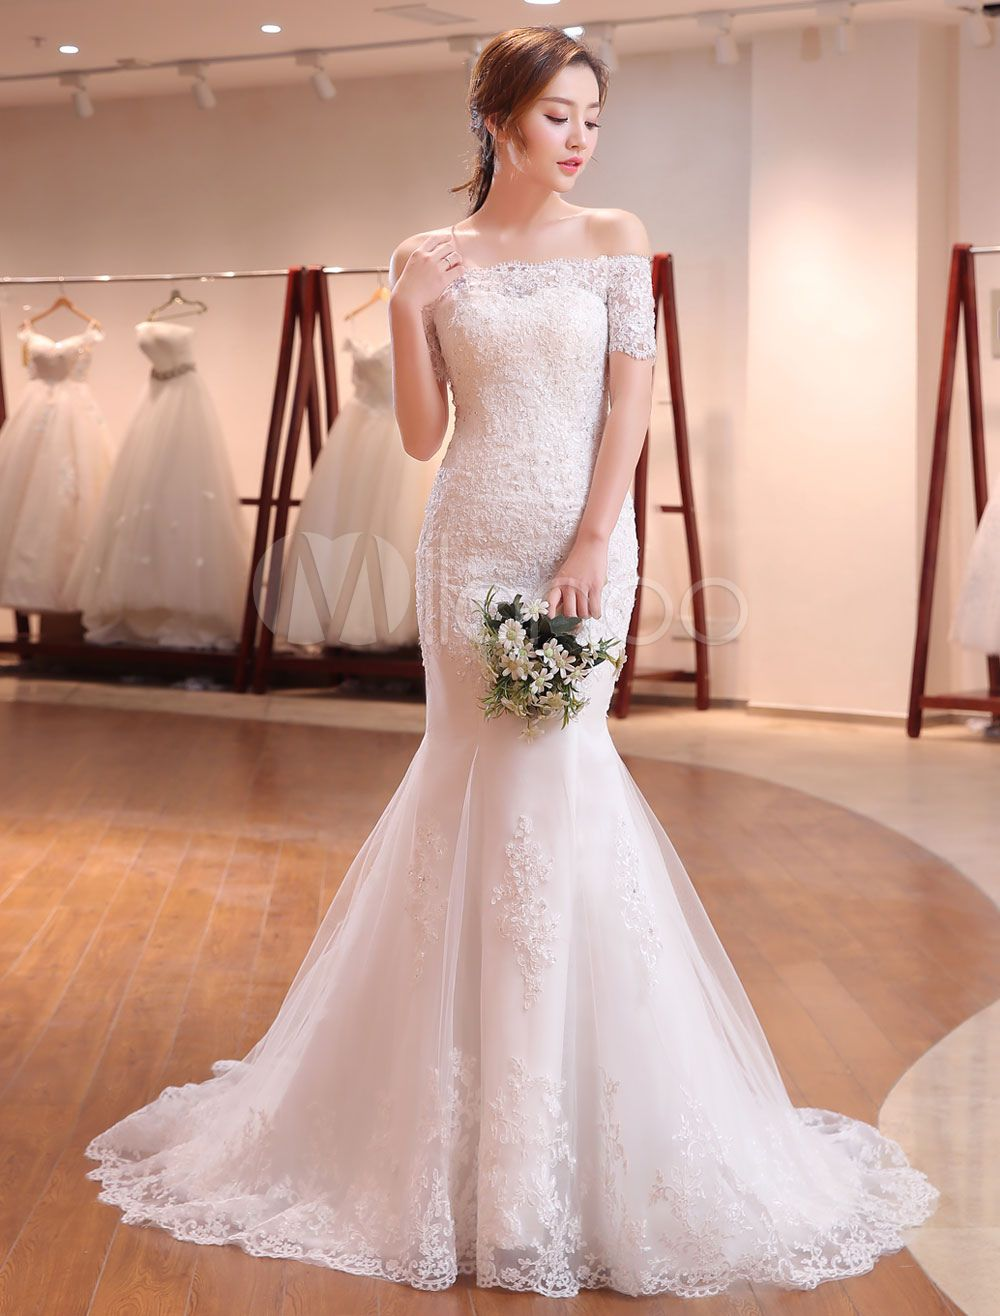 Mermaid wedding dresses lace beading off the shoulder short sleeve